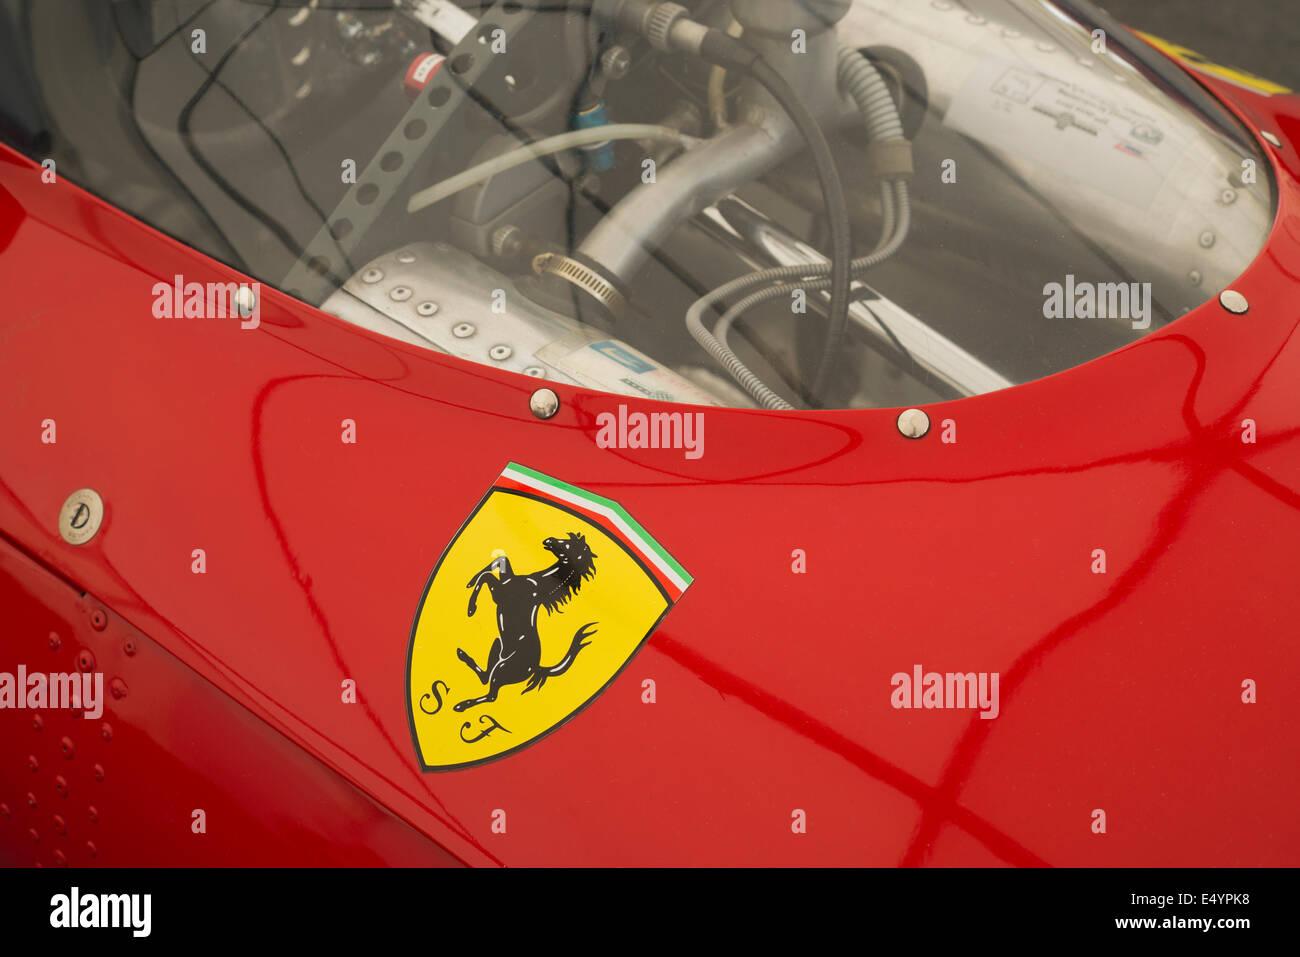 Ferrari prancing horse logo on a red racing car - Stock Image